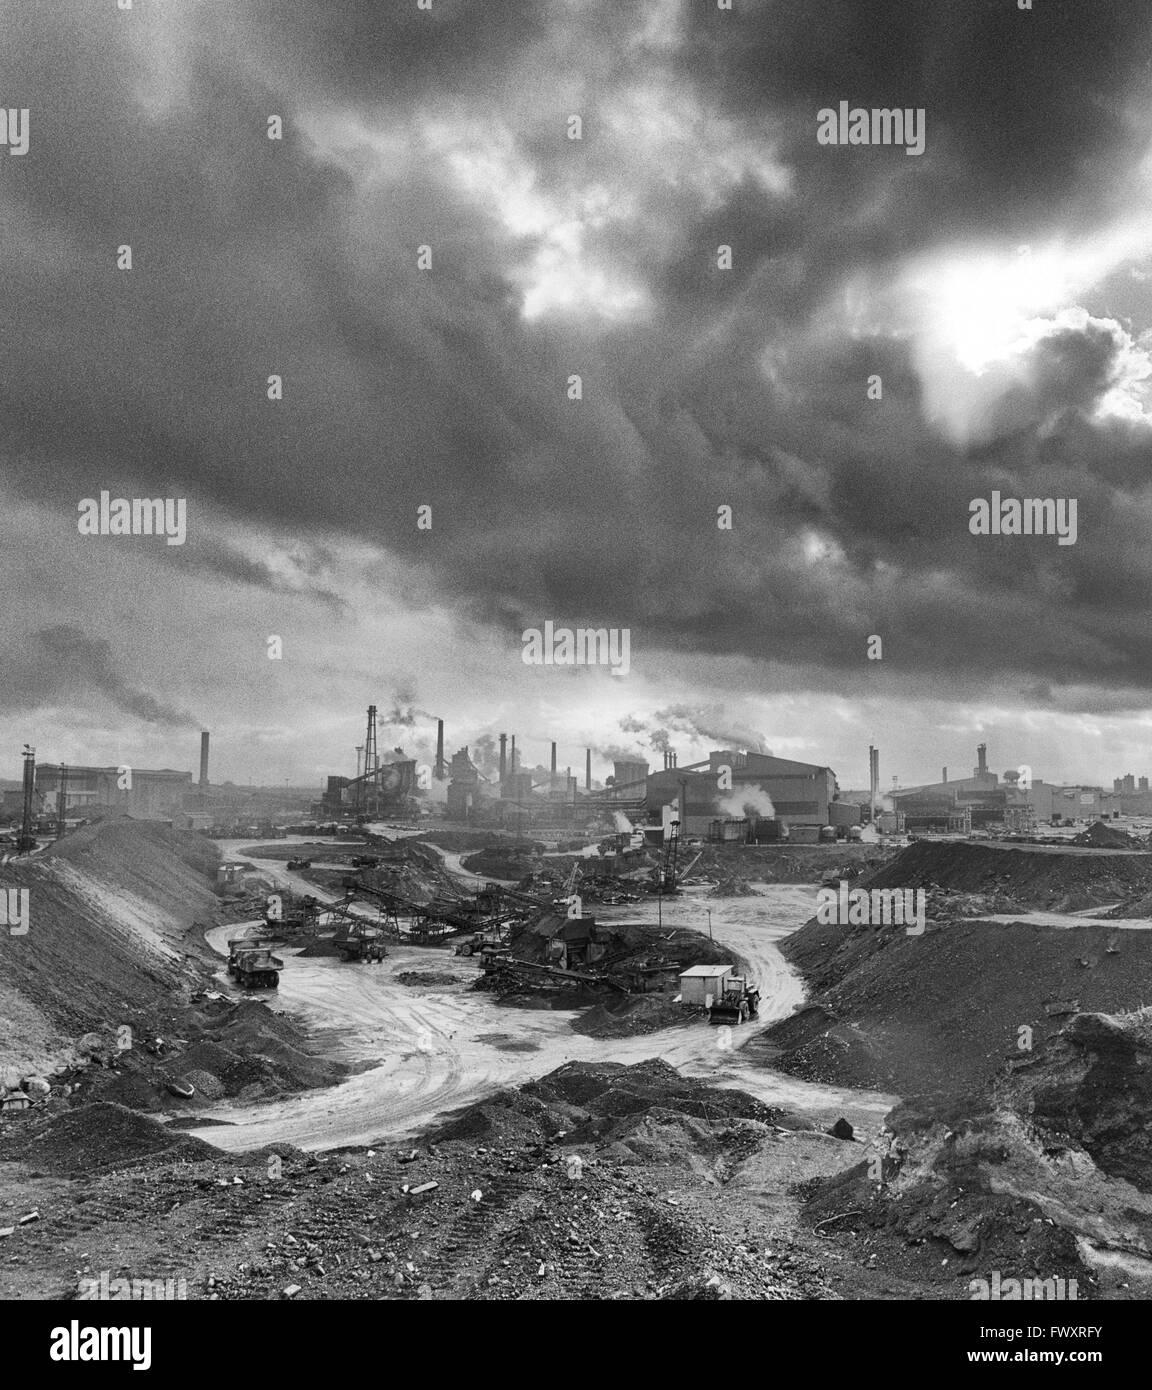 Ravenscraig steel works, Motherwell, Scotland. 1989 - Stock Image